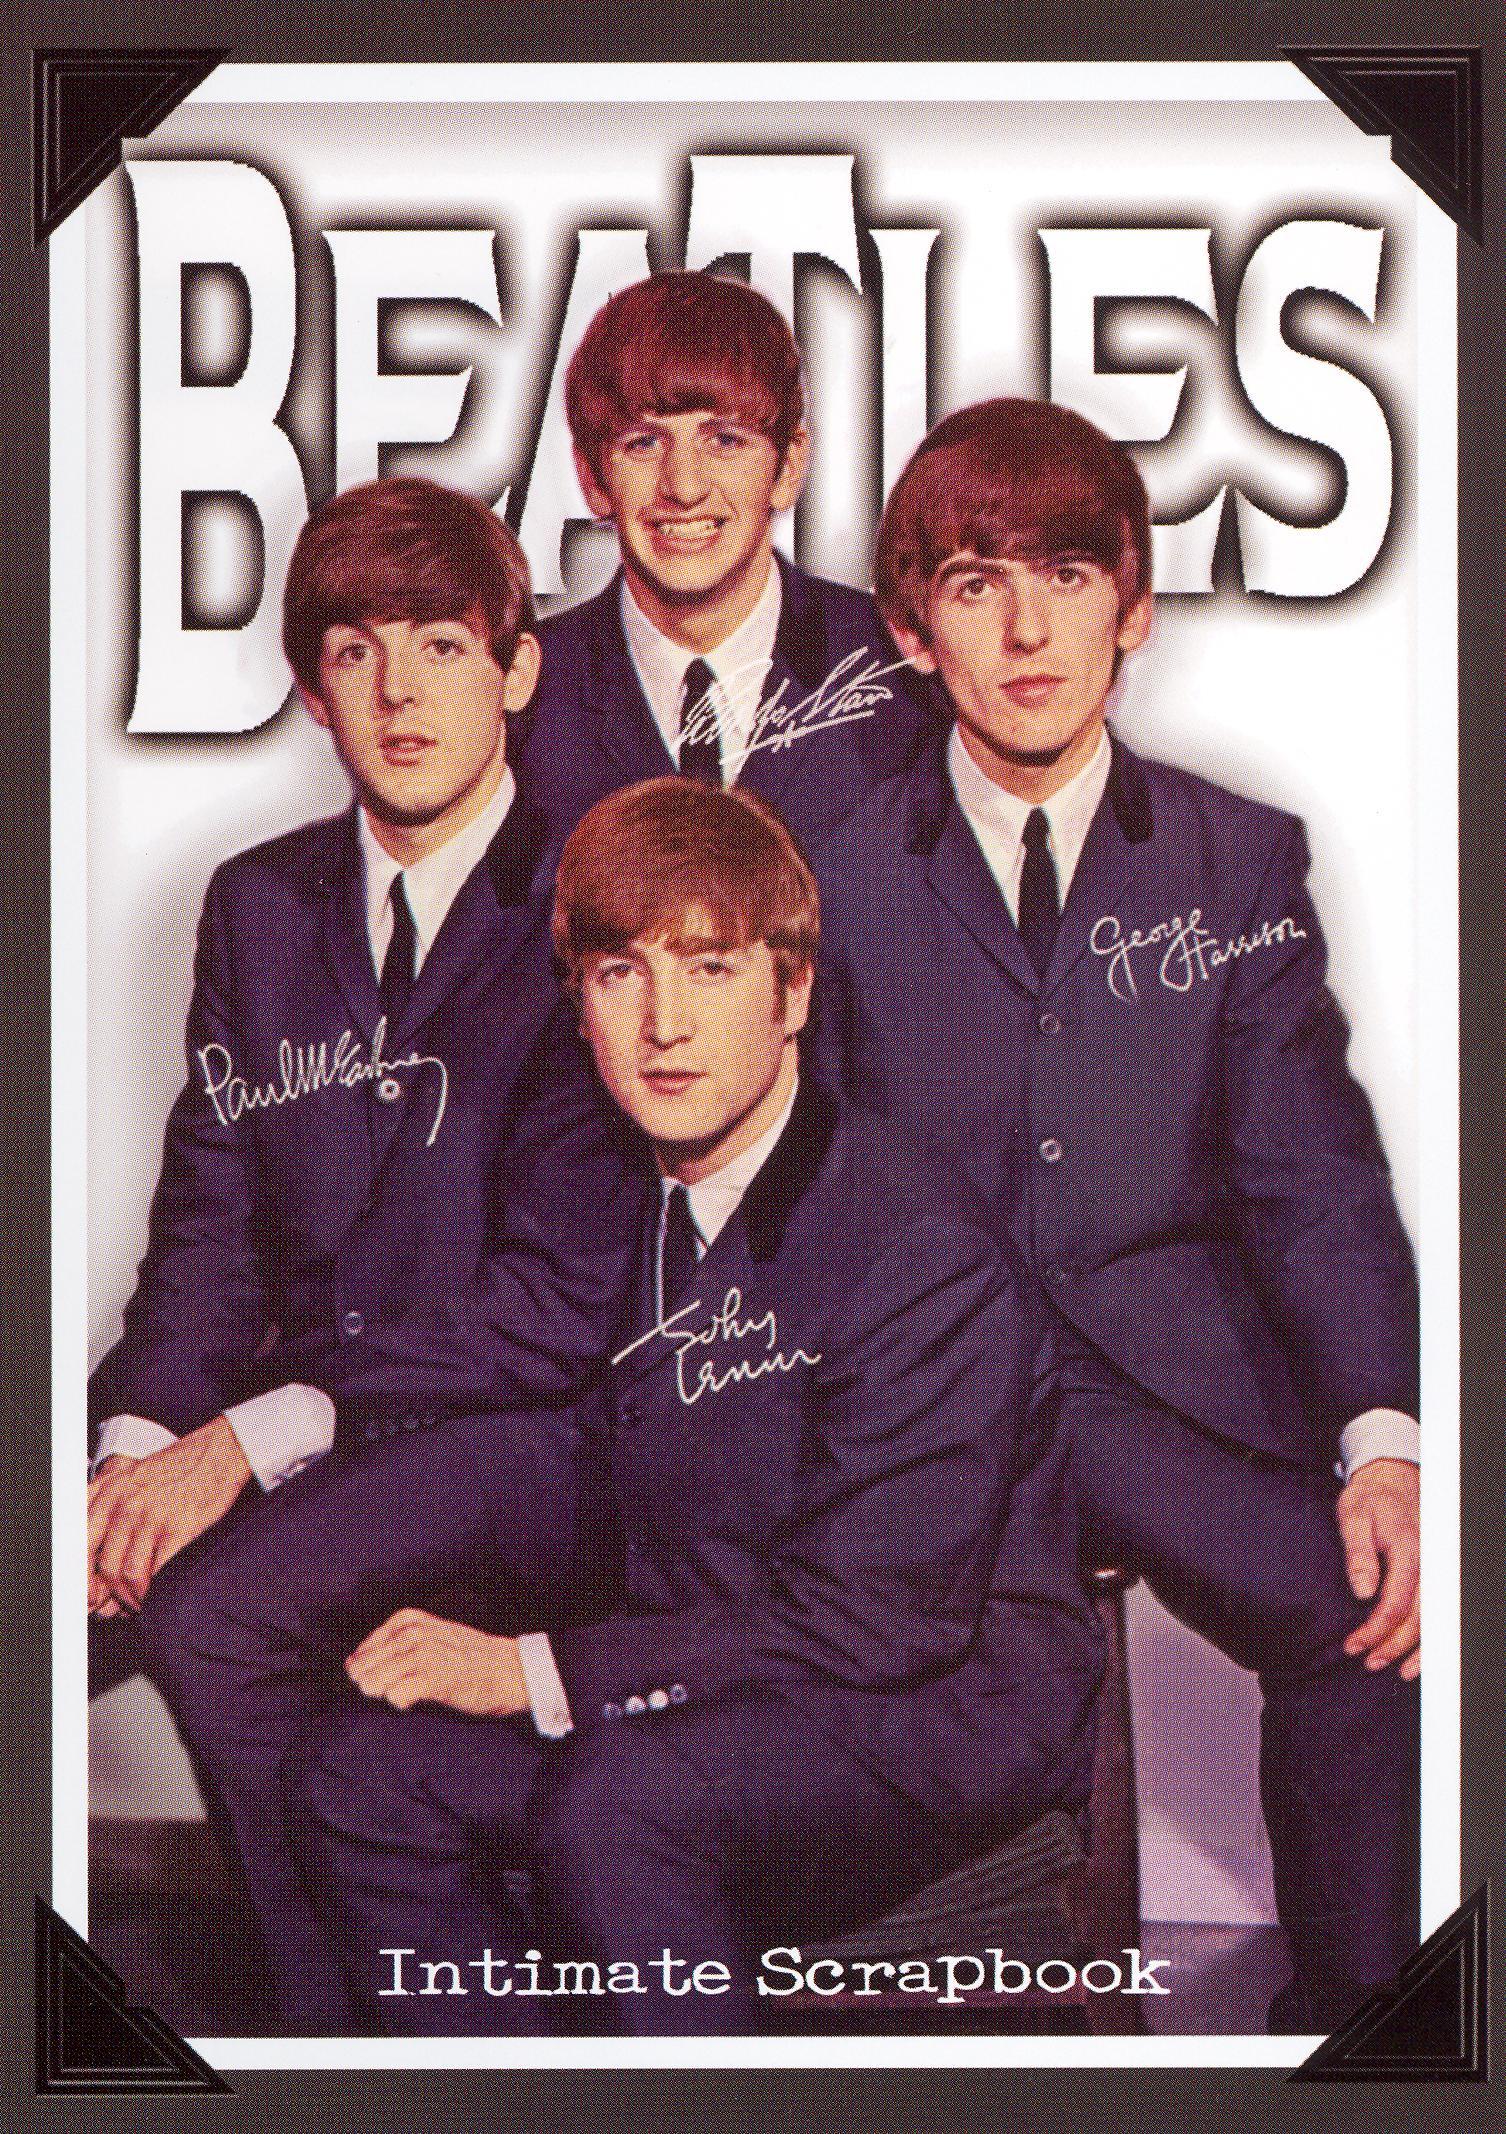 The Beatles: Intimate Scrapbook